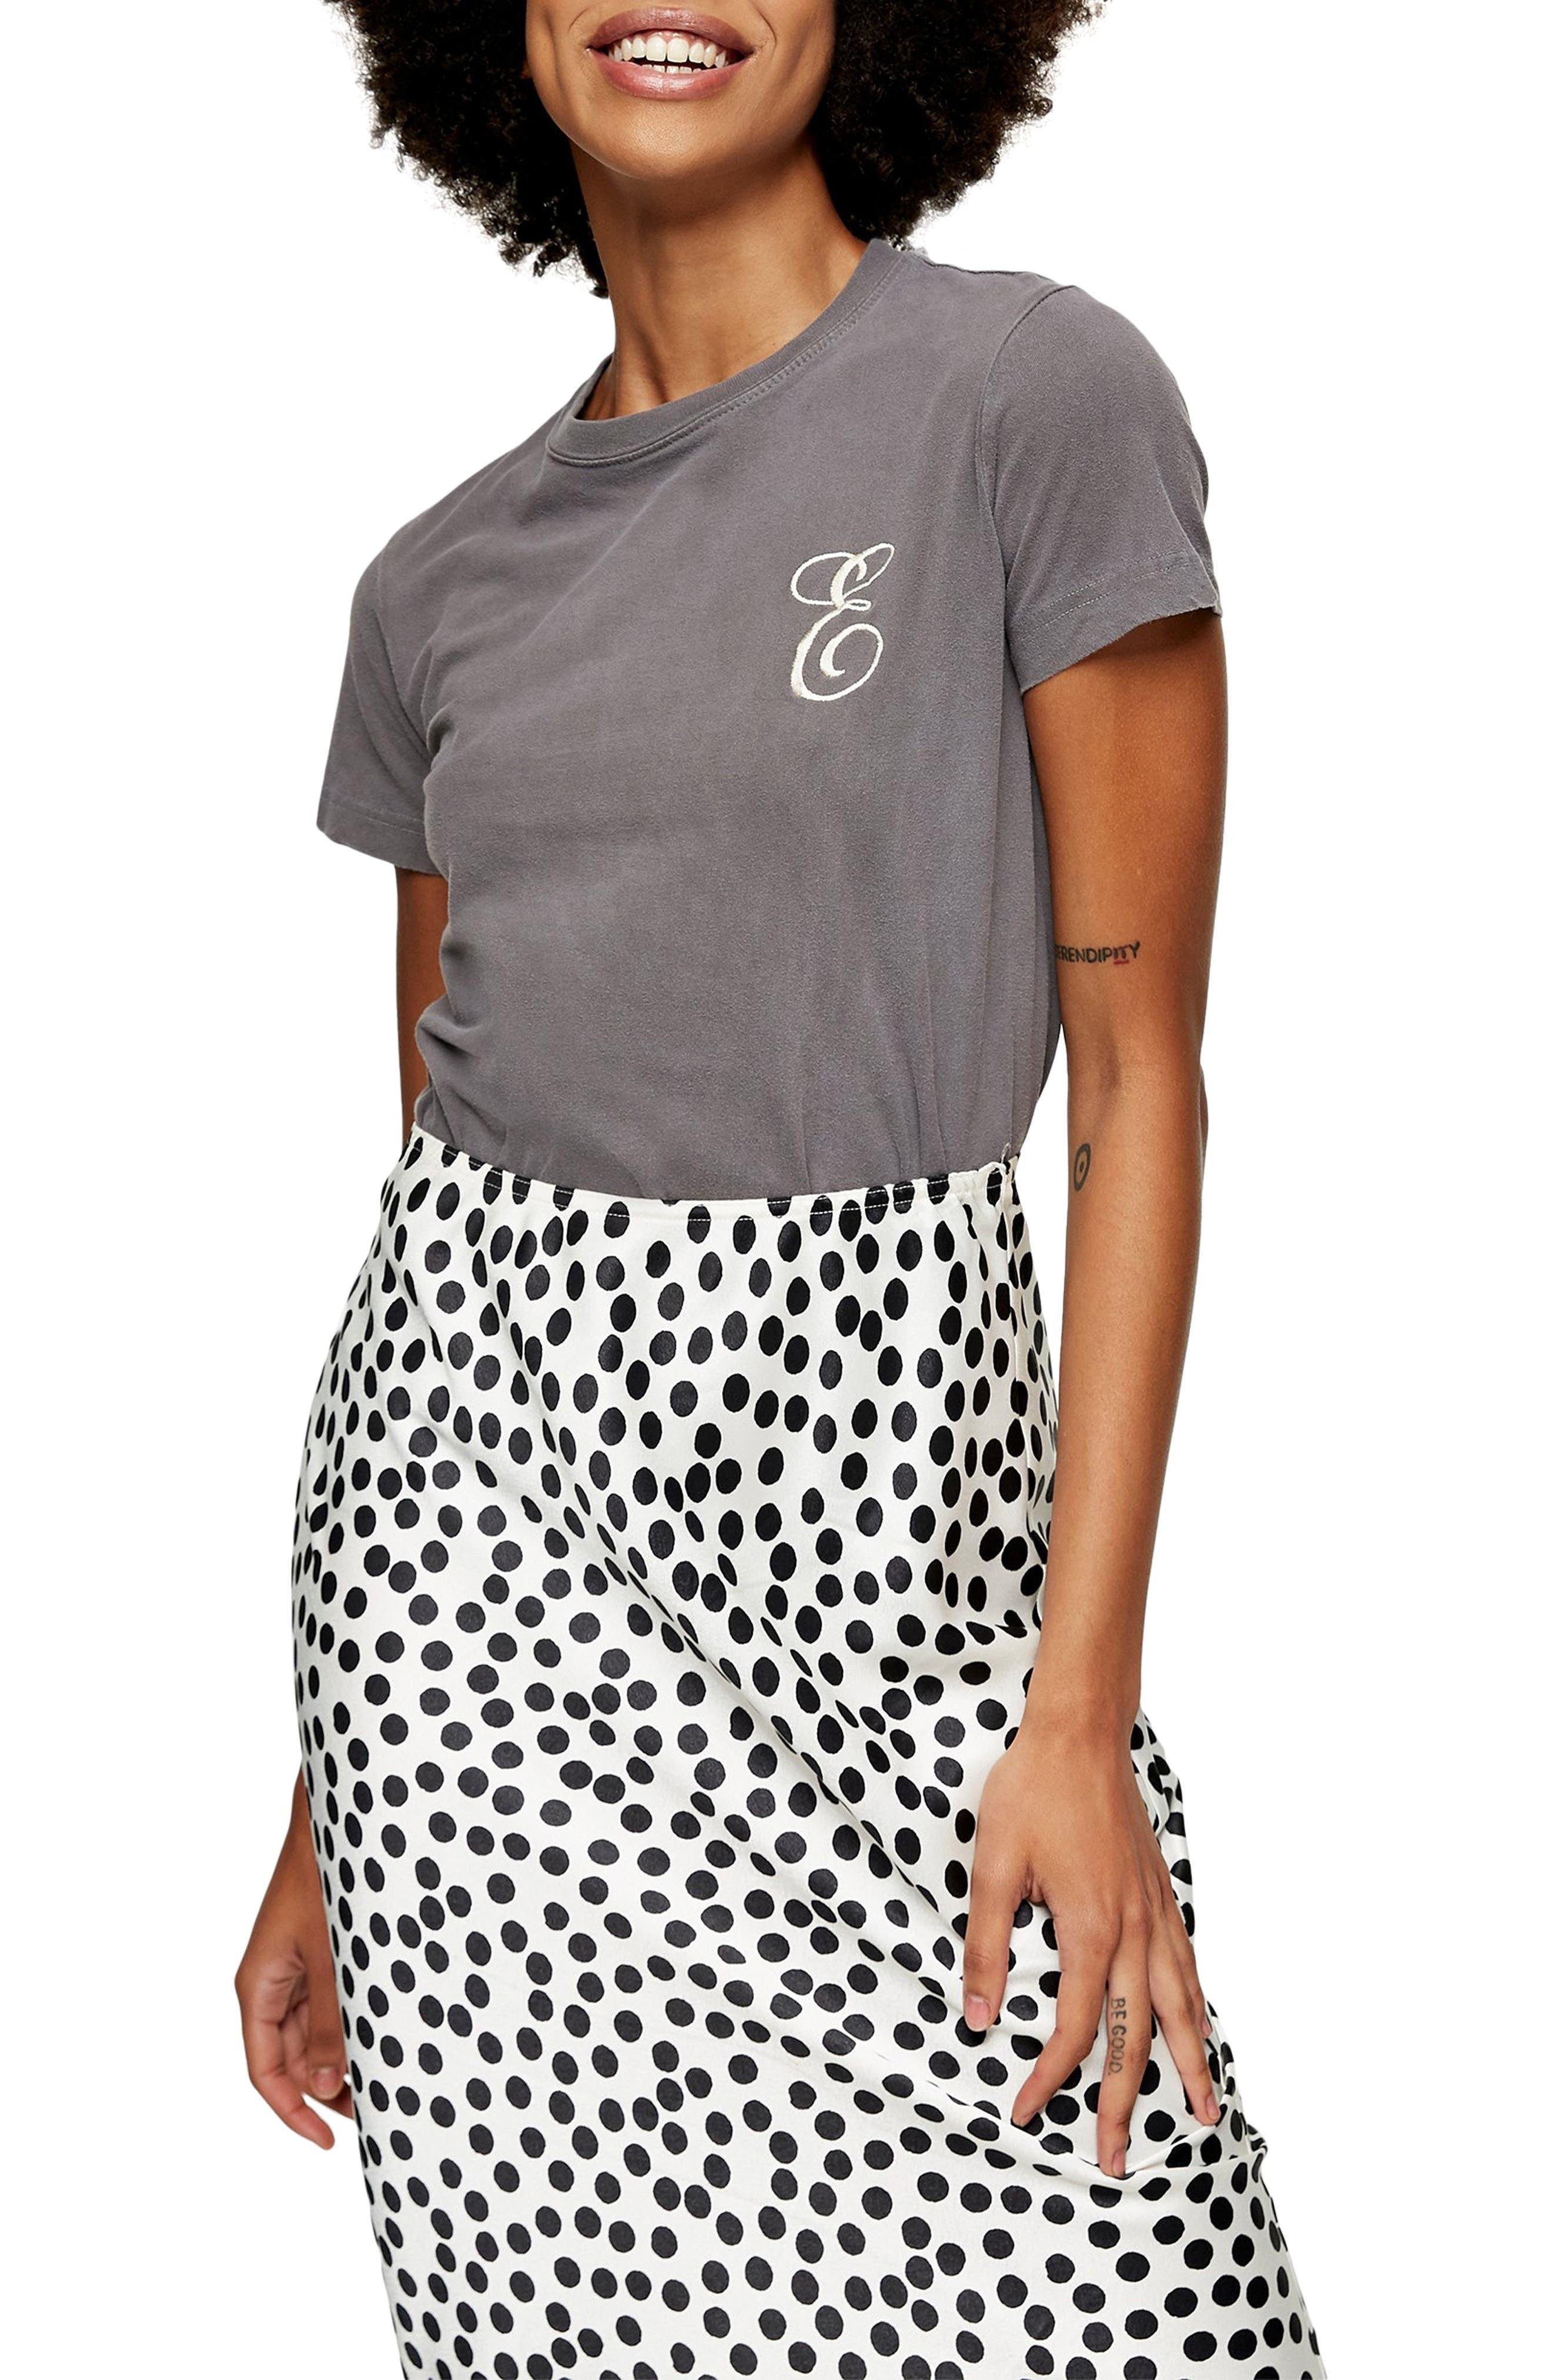 Topshop Embroidered Letter T-Shirt | Nordstrom